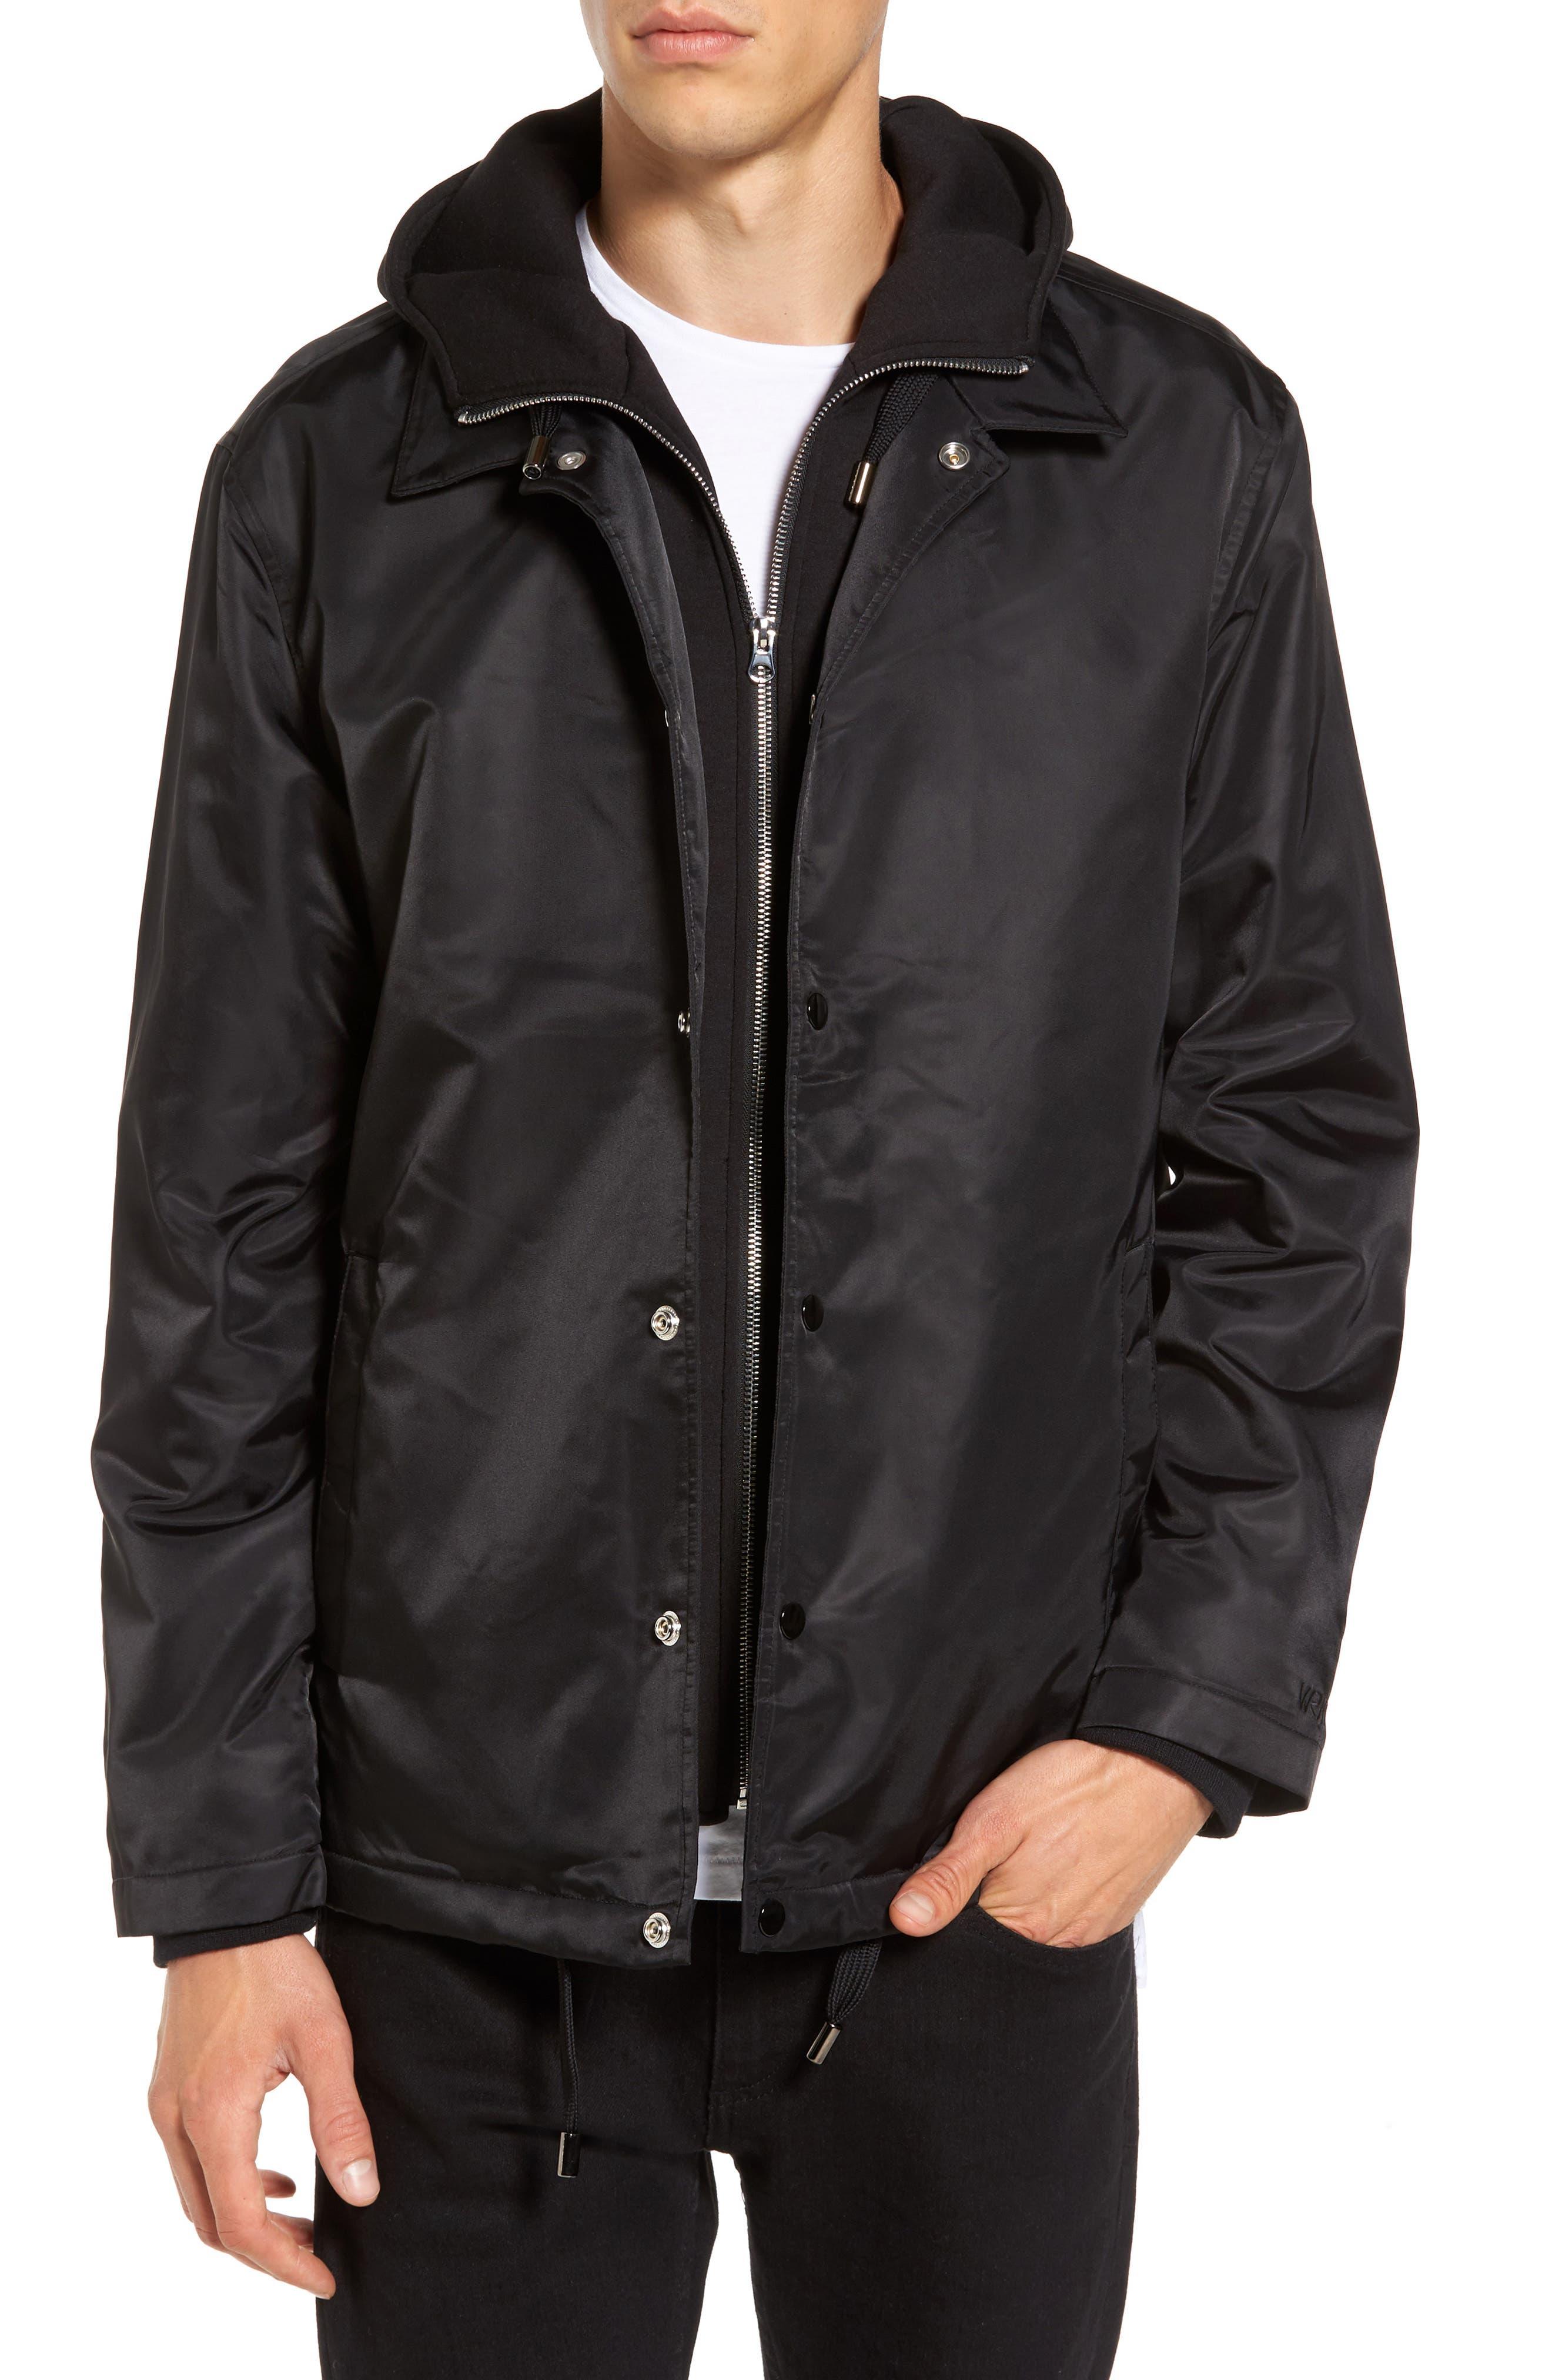 Yorkshire Hooded Coach's Jacket,                             Main thumbnail 1, color,                             001